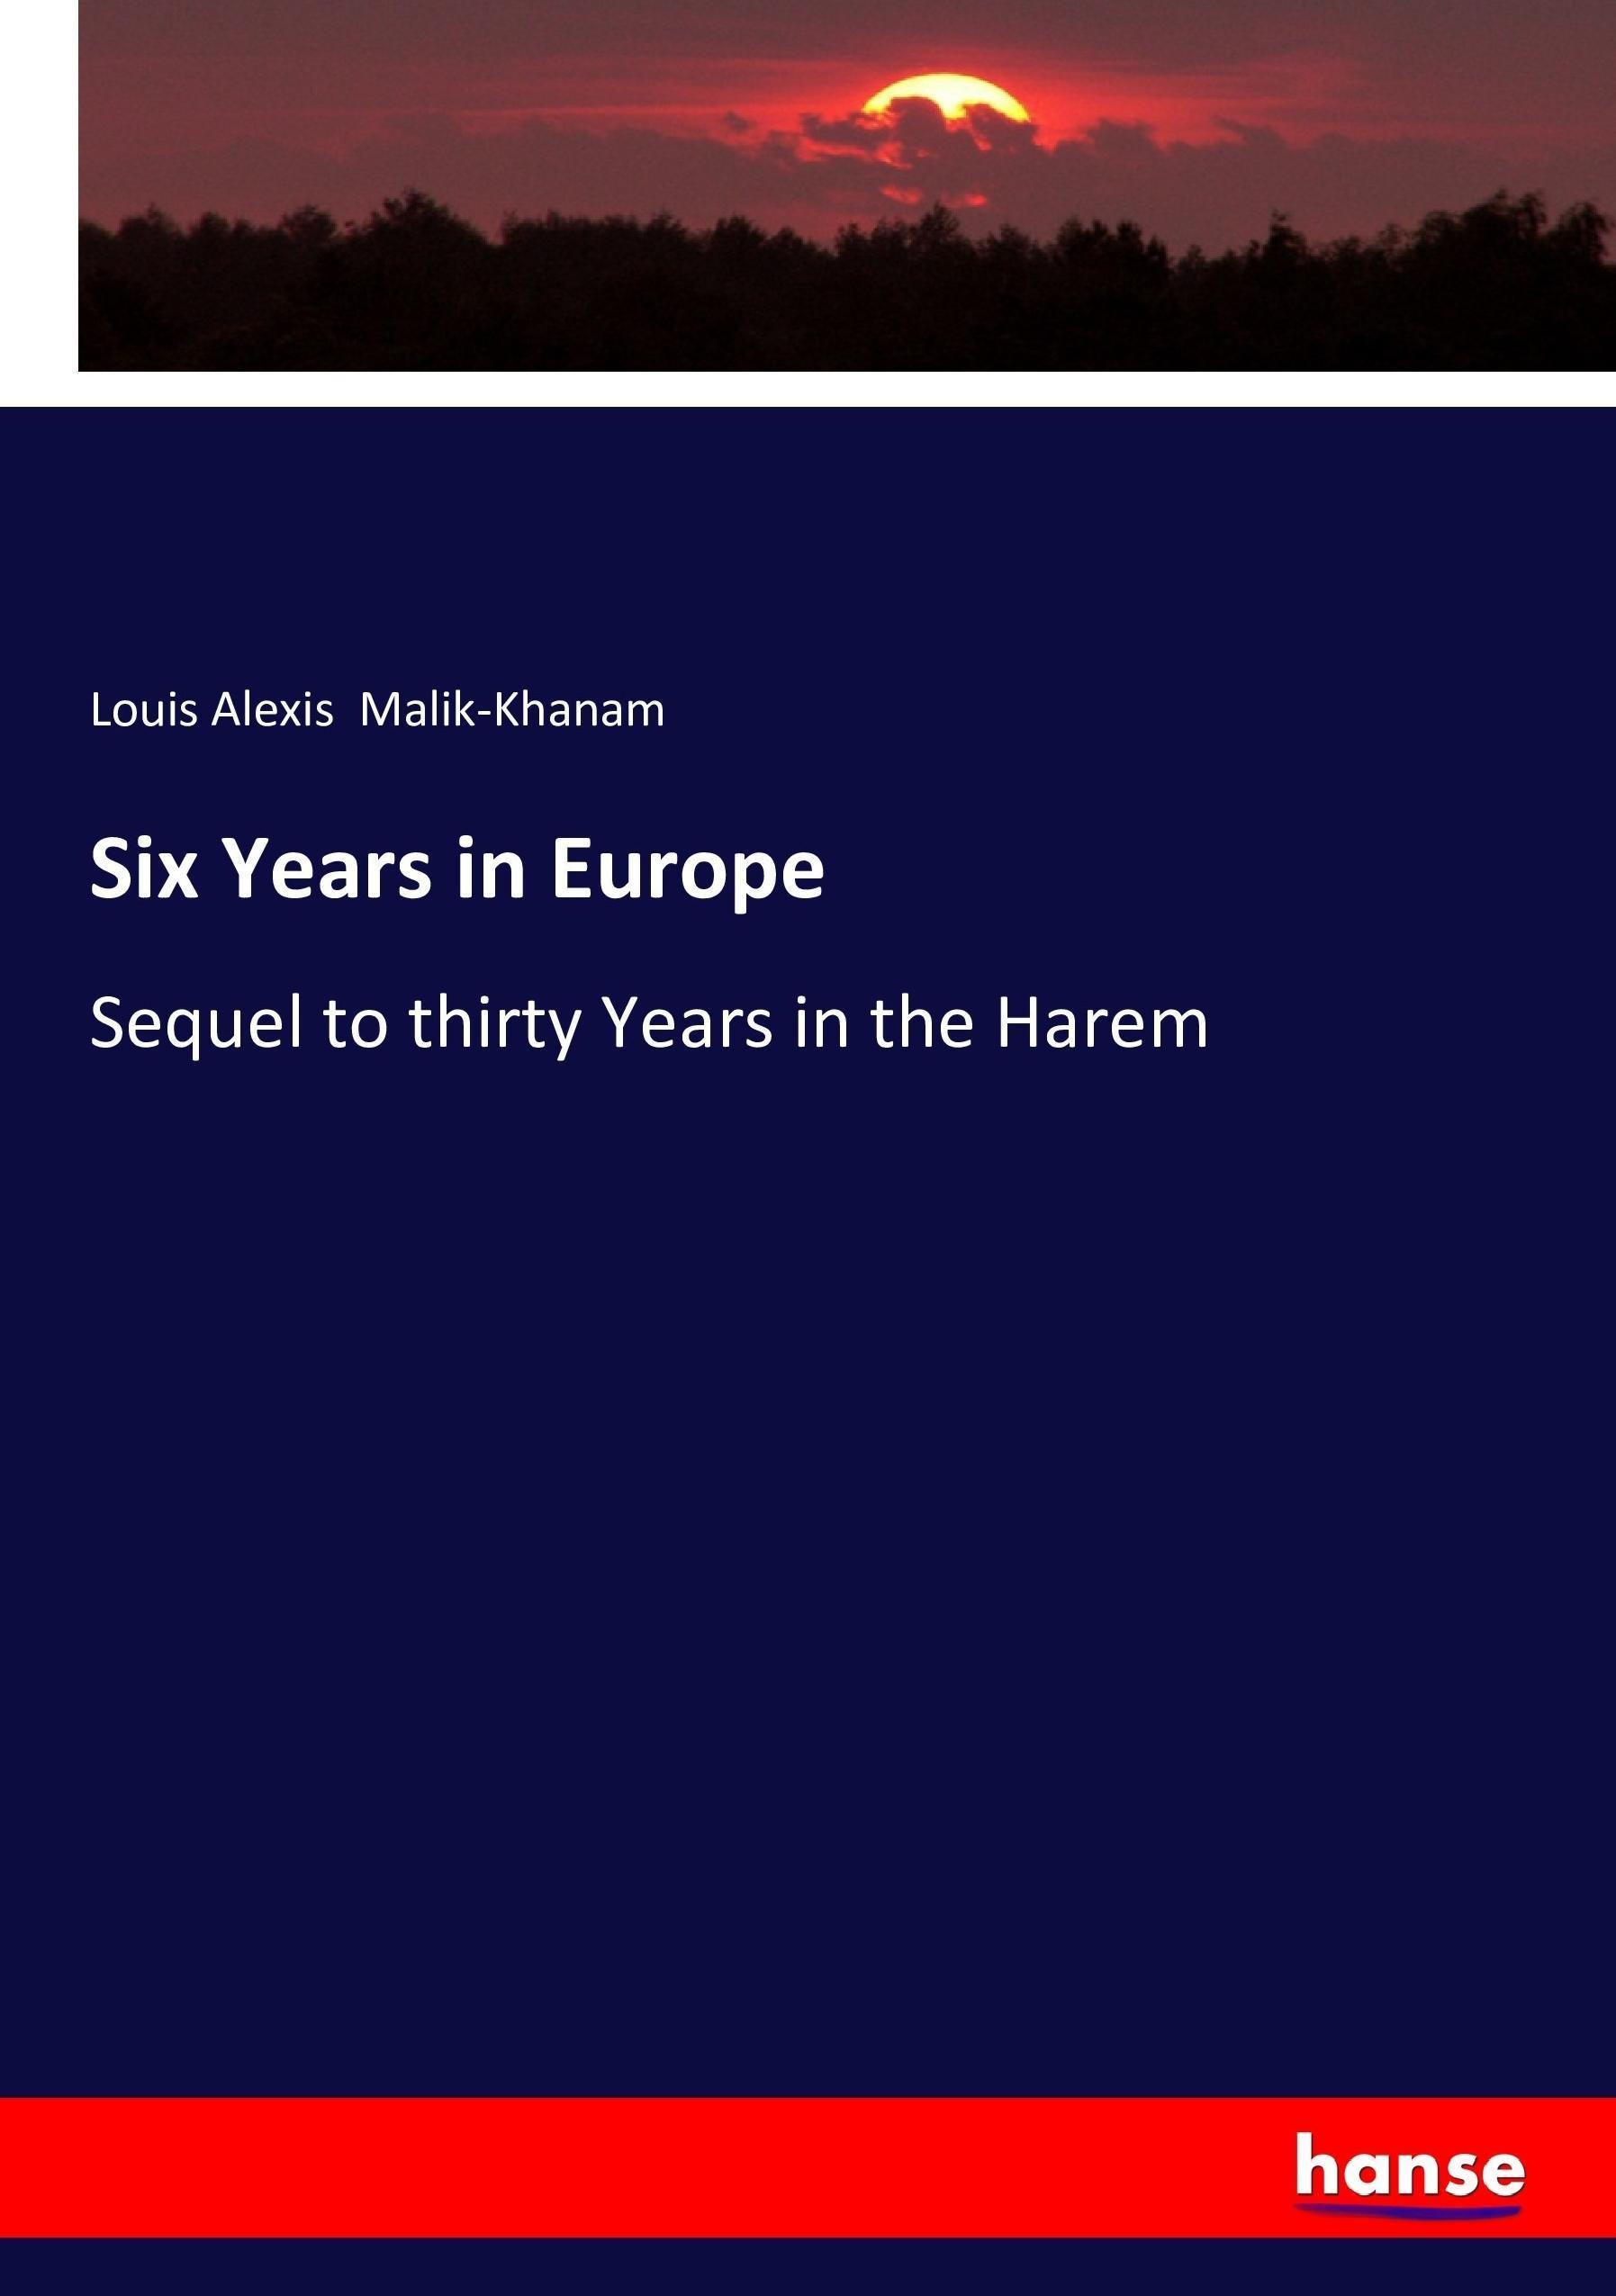 Six Years in Europe Louis Alexis Malik-Khanam